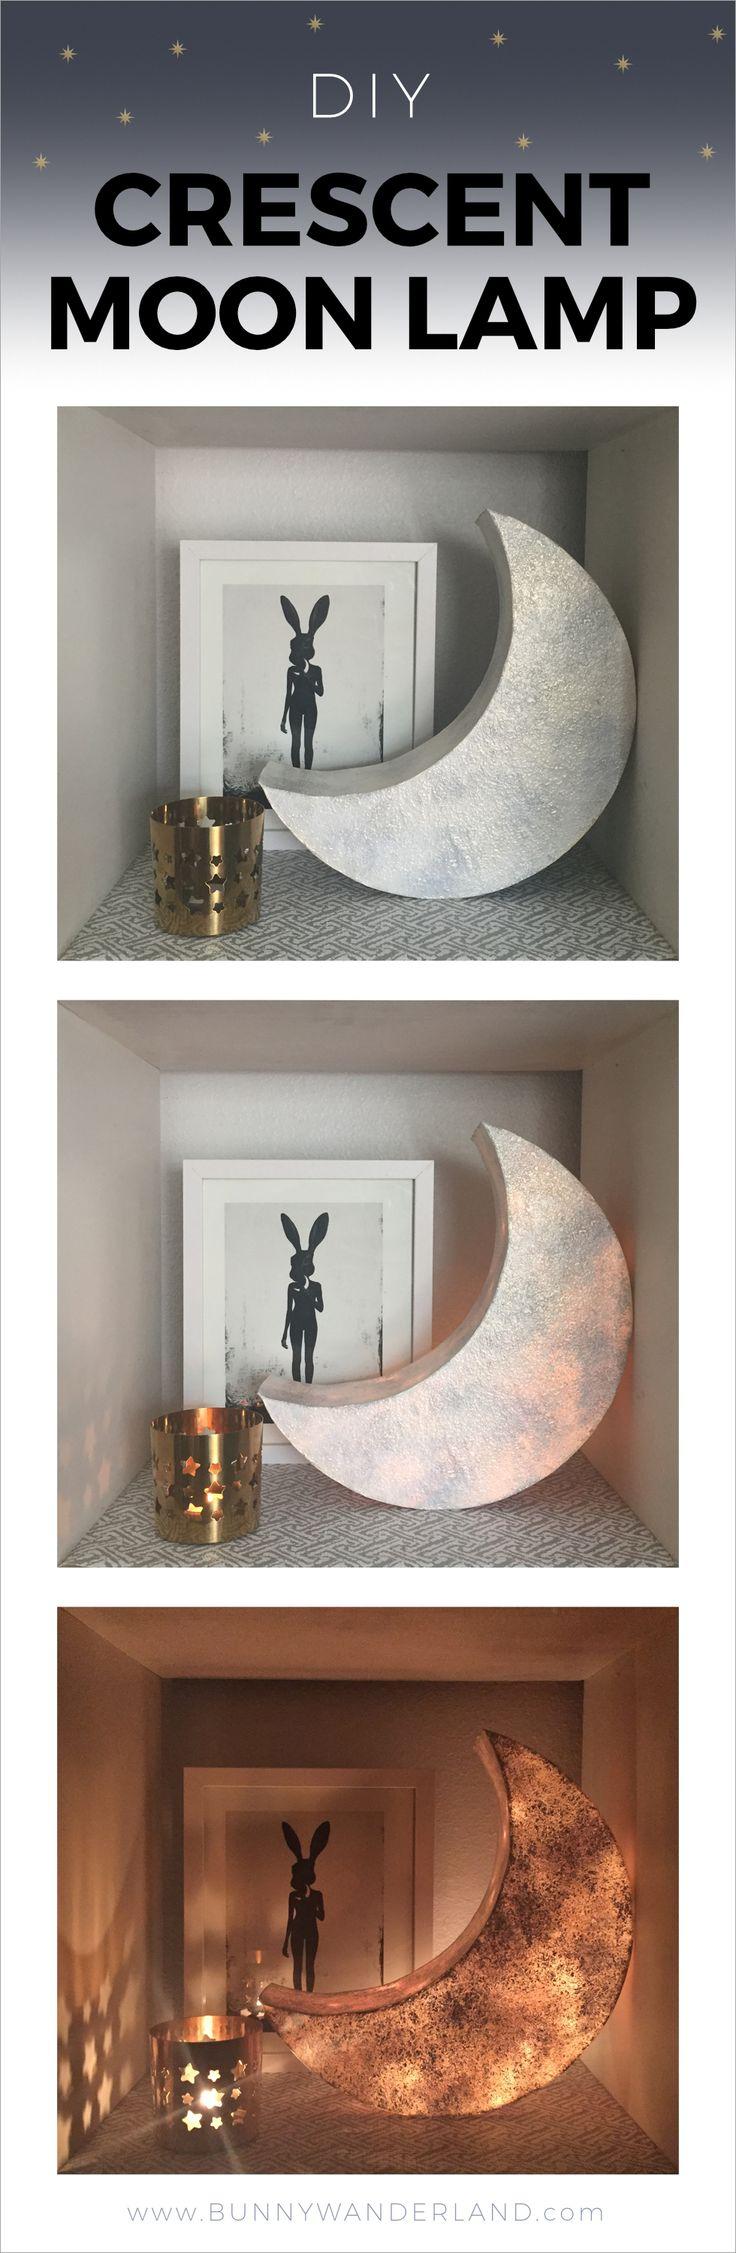 http://bunnywanderland.com   DIY Crescent Moon Lamp